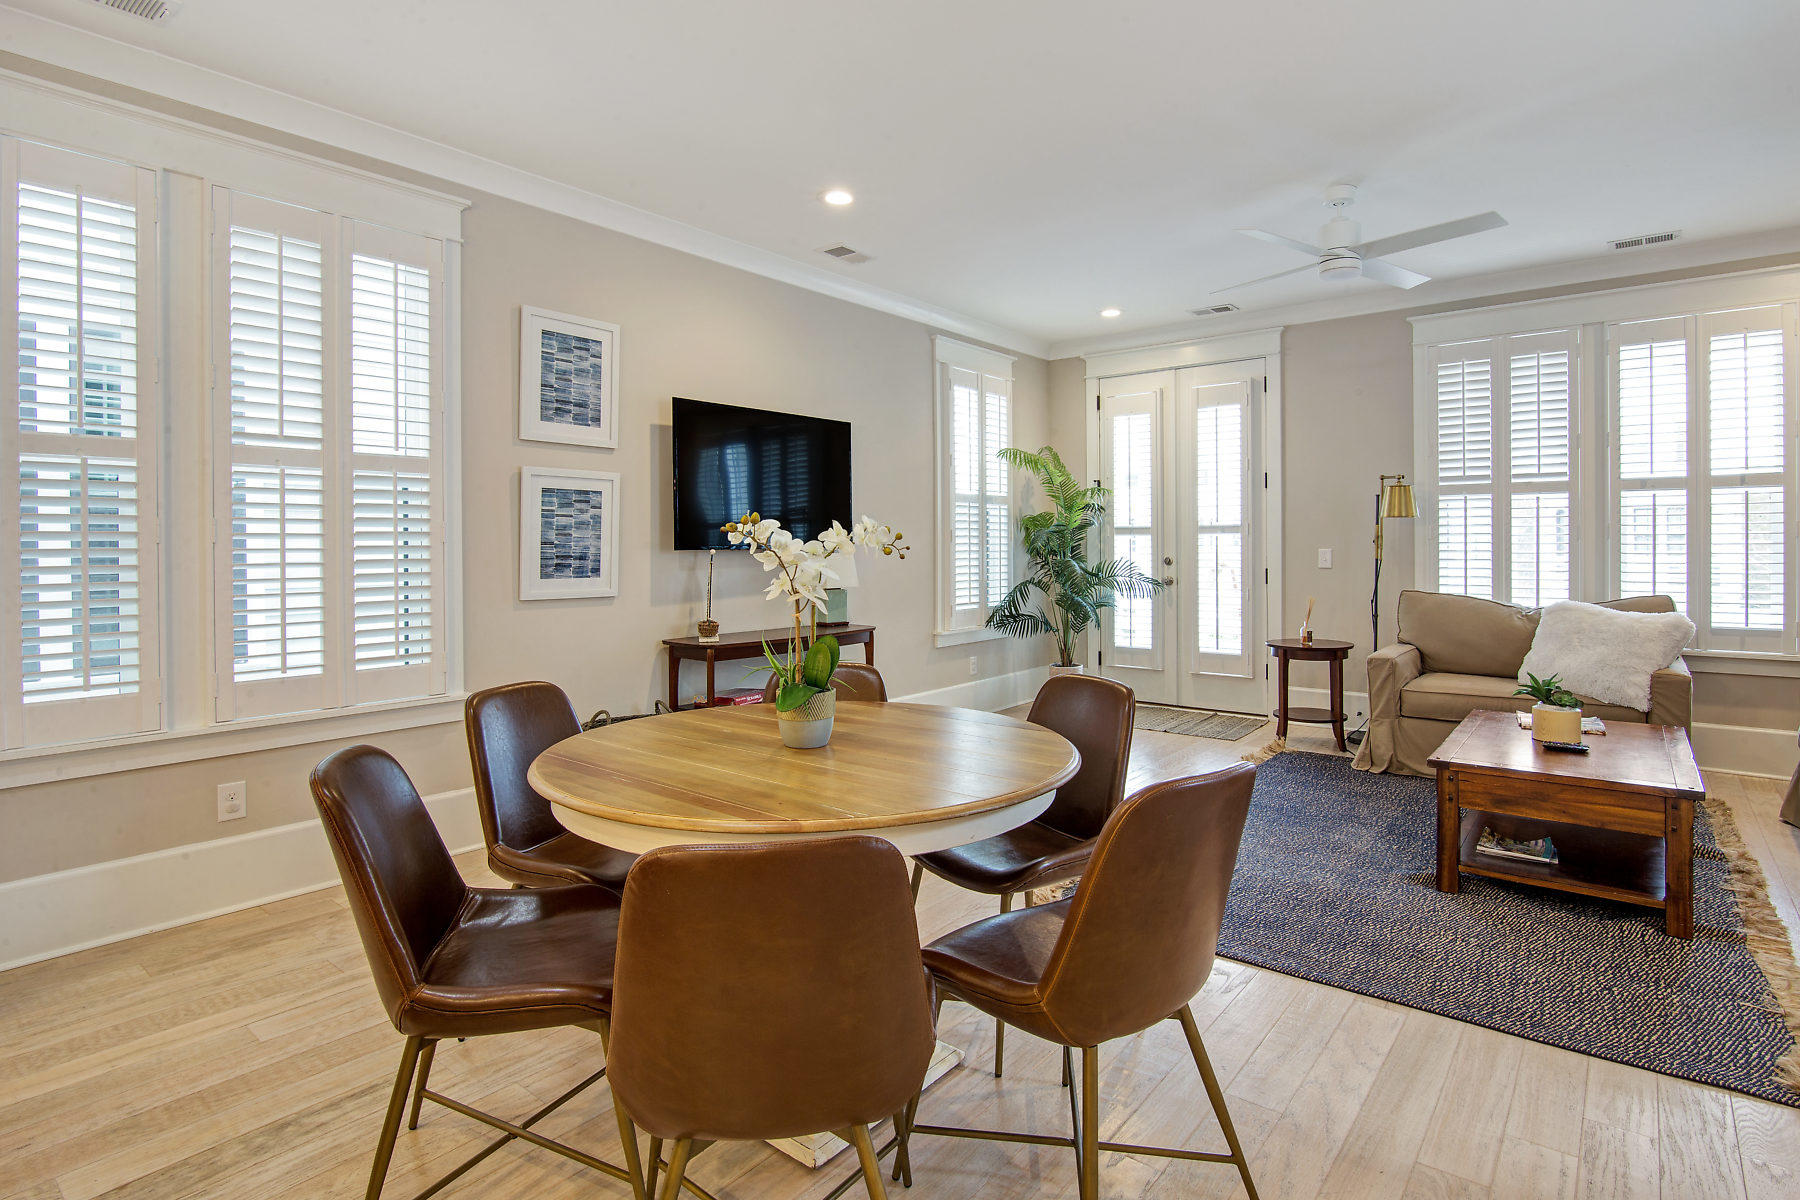 Sullivans Pointe Homes For Sale - 964 Key Colony, Mount Pleasant, SC - 22